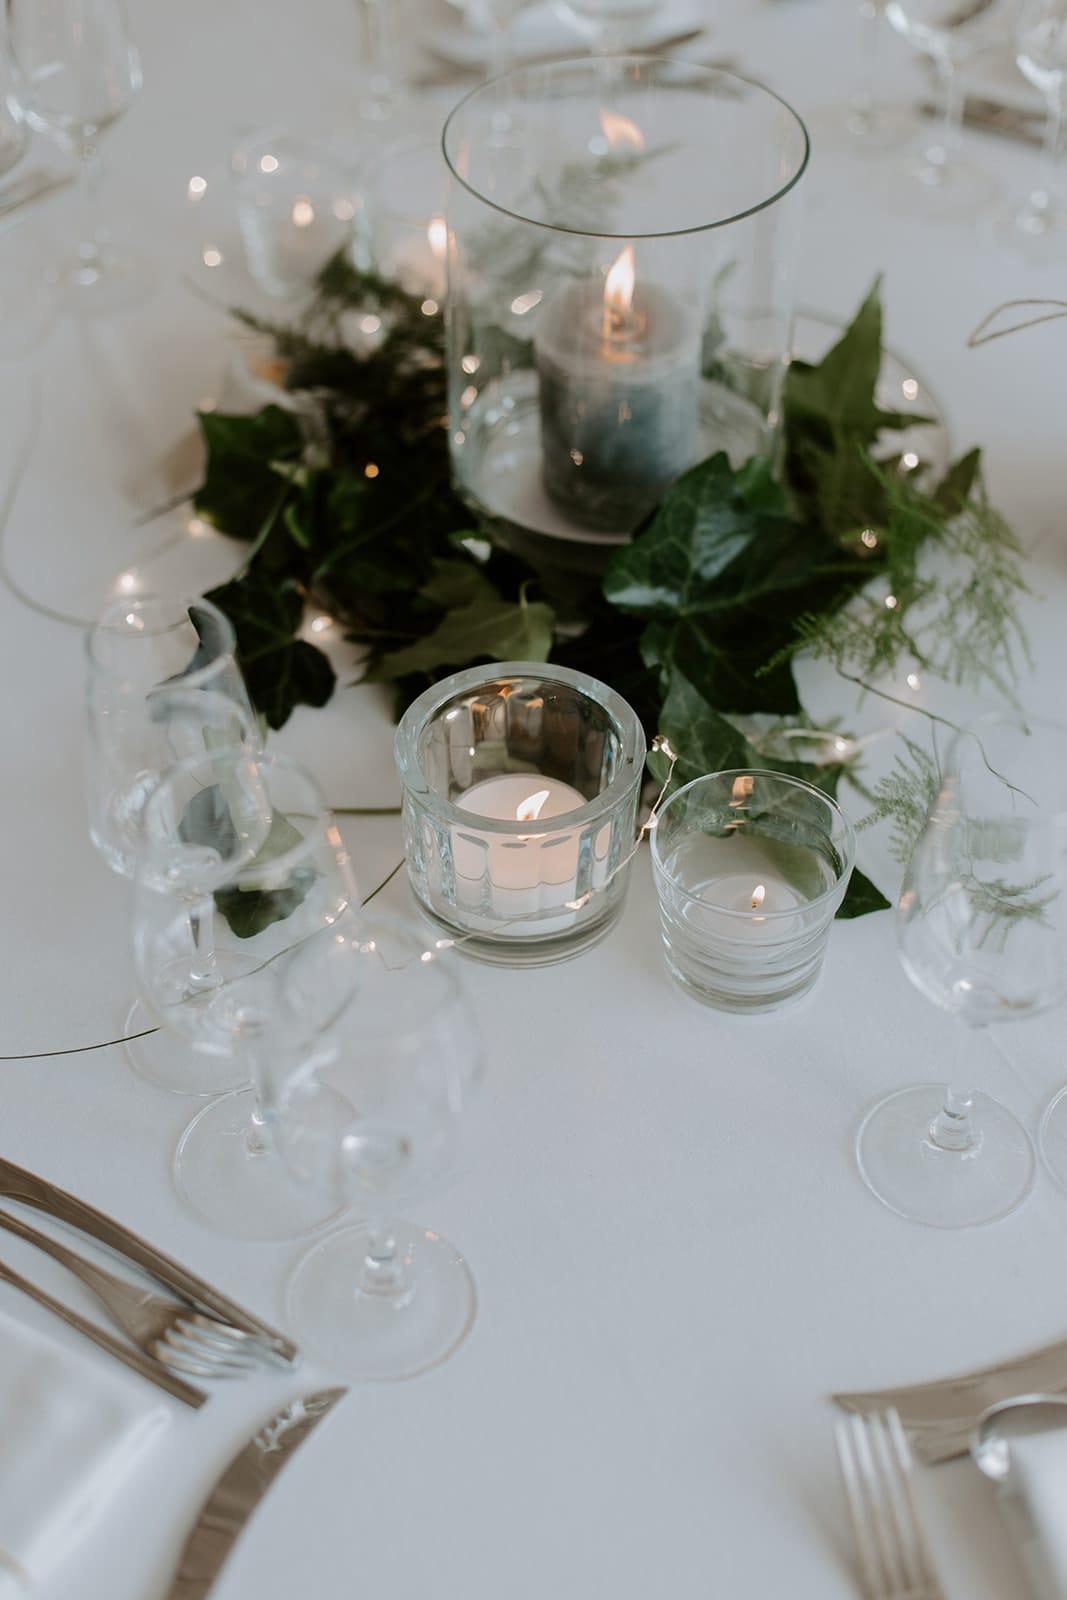 mariage_chateau_la_flocelliere_vendee_flavie_nelly_photographe-40-obonheurdesdames-decoration-mariage-location-vegetal